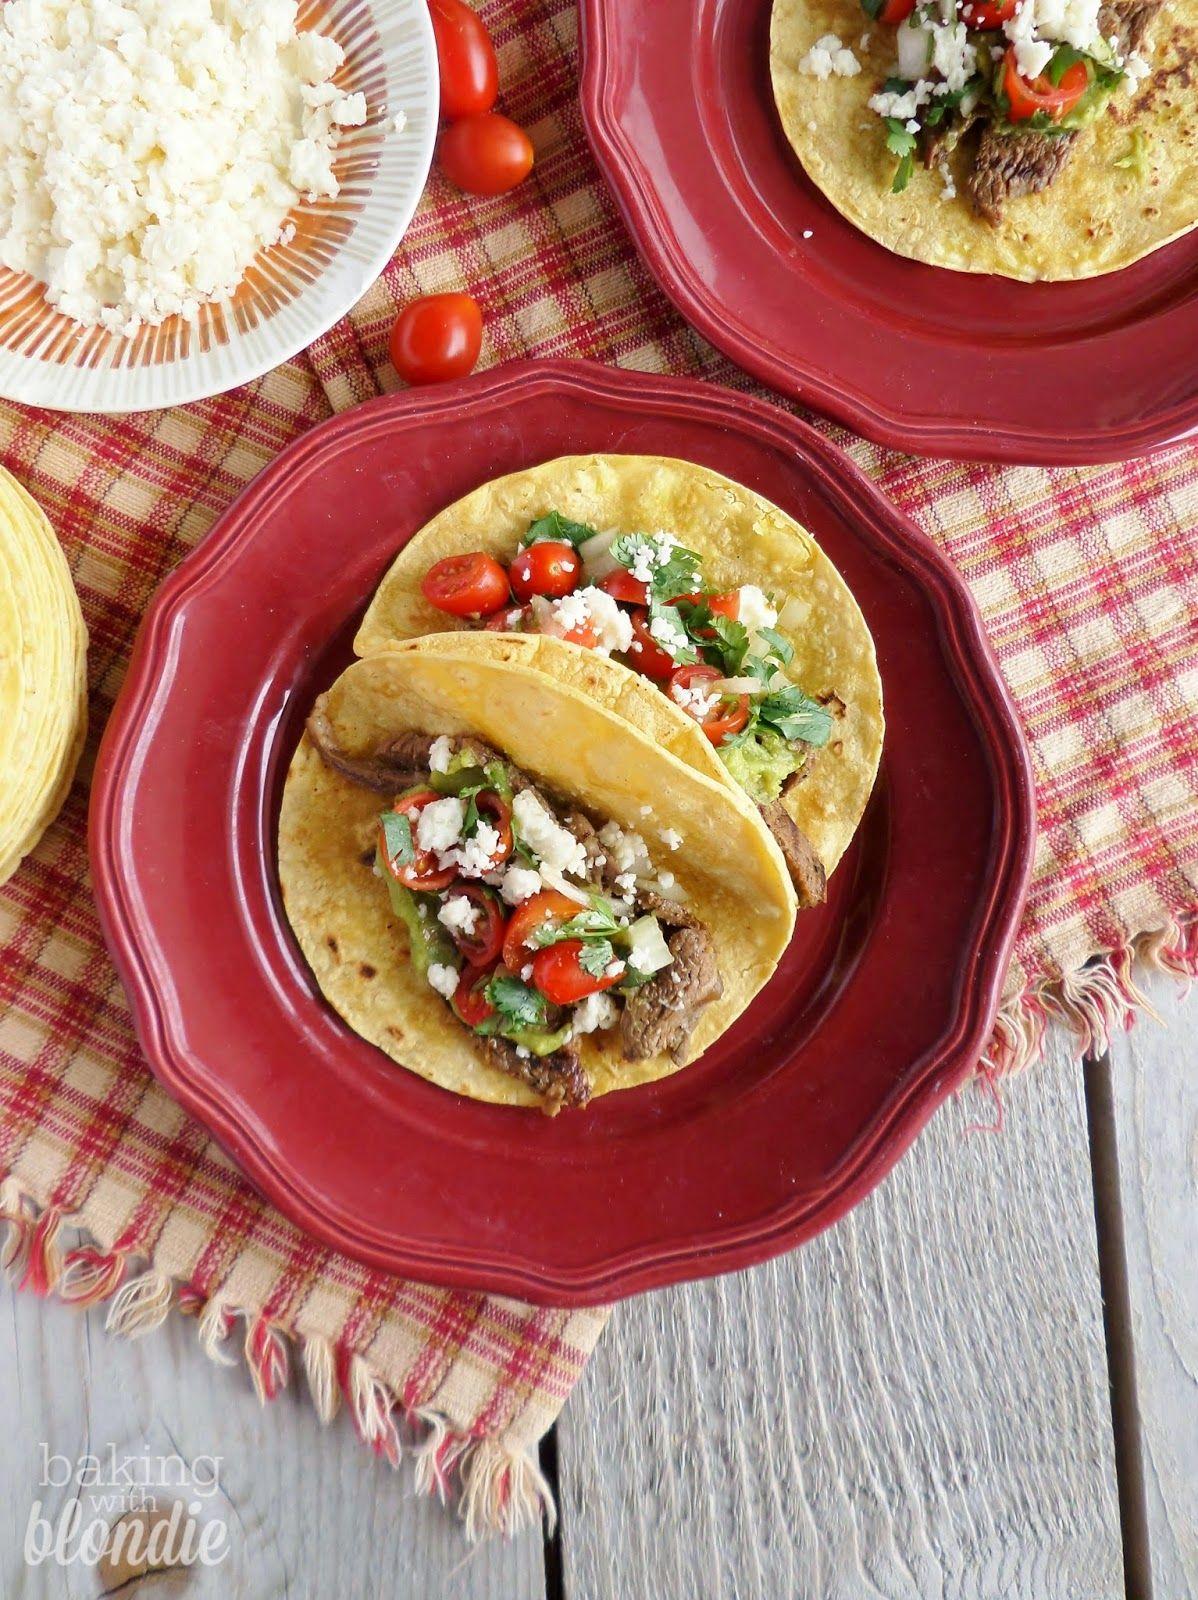 Authentic Carne Asada Tacos - The center of all food and cake recipes #asadatacos